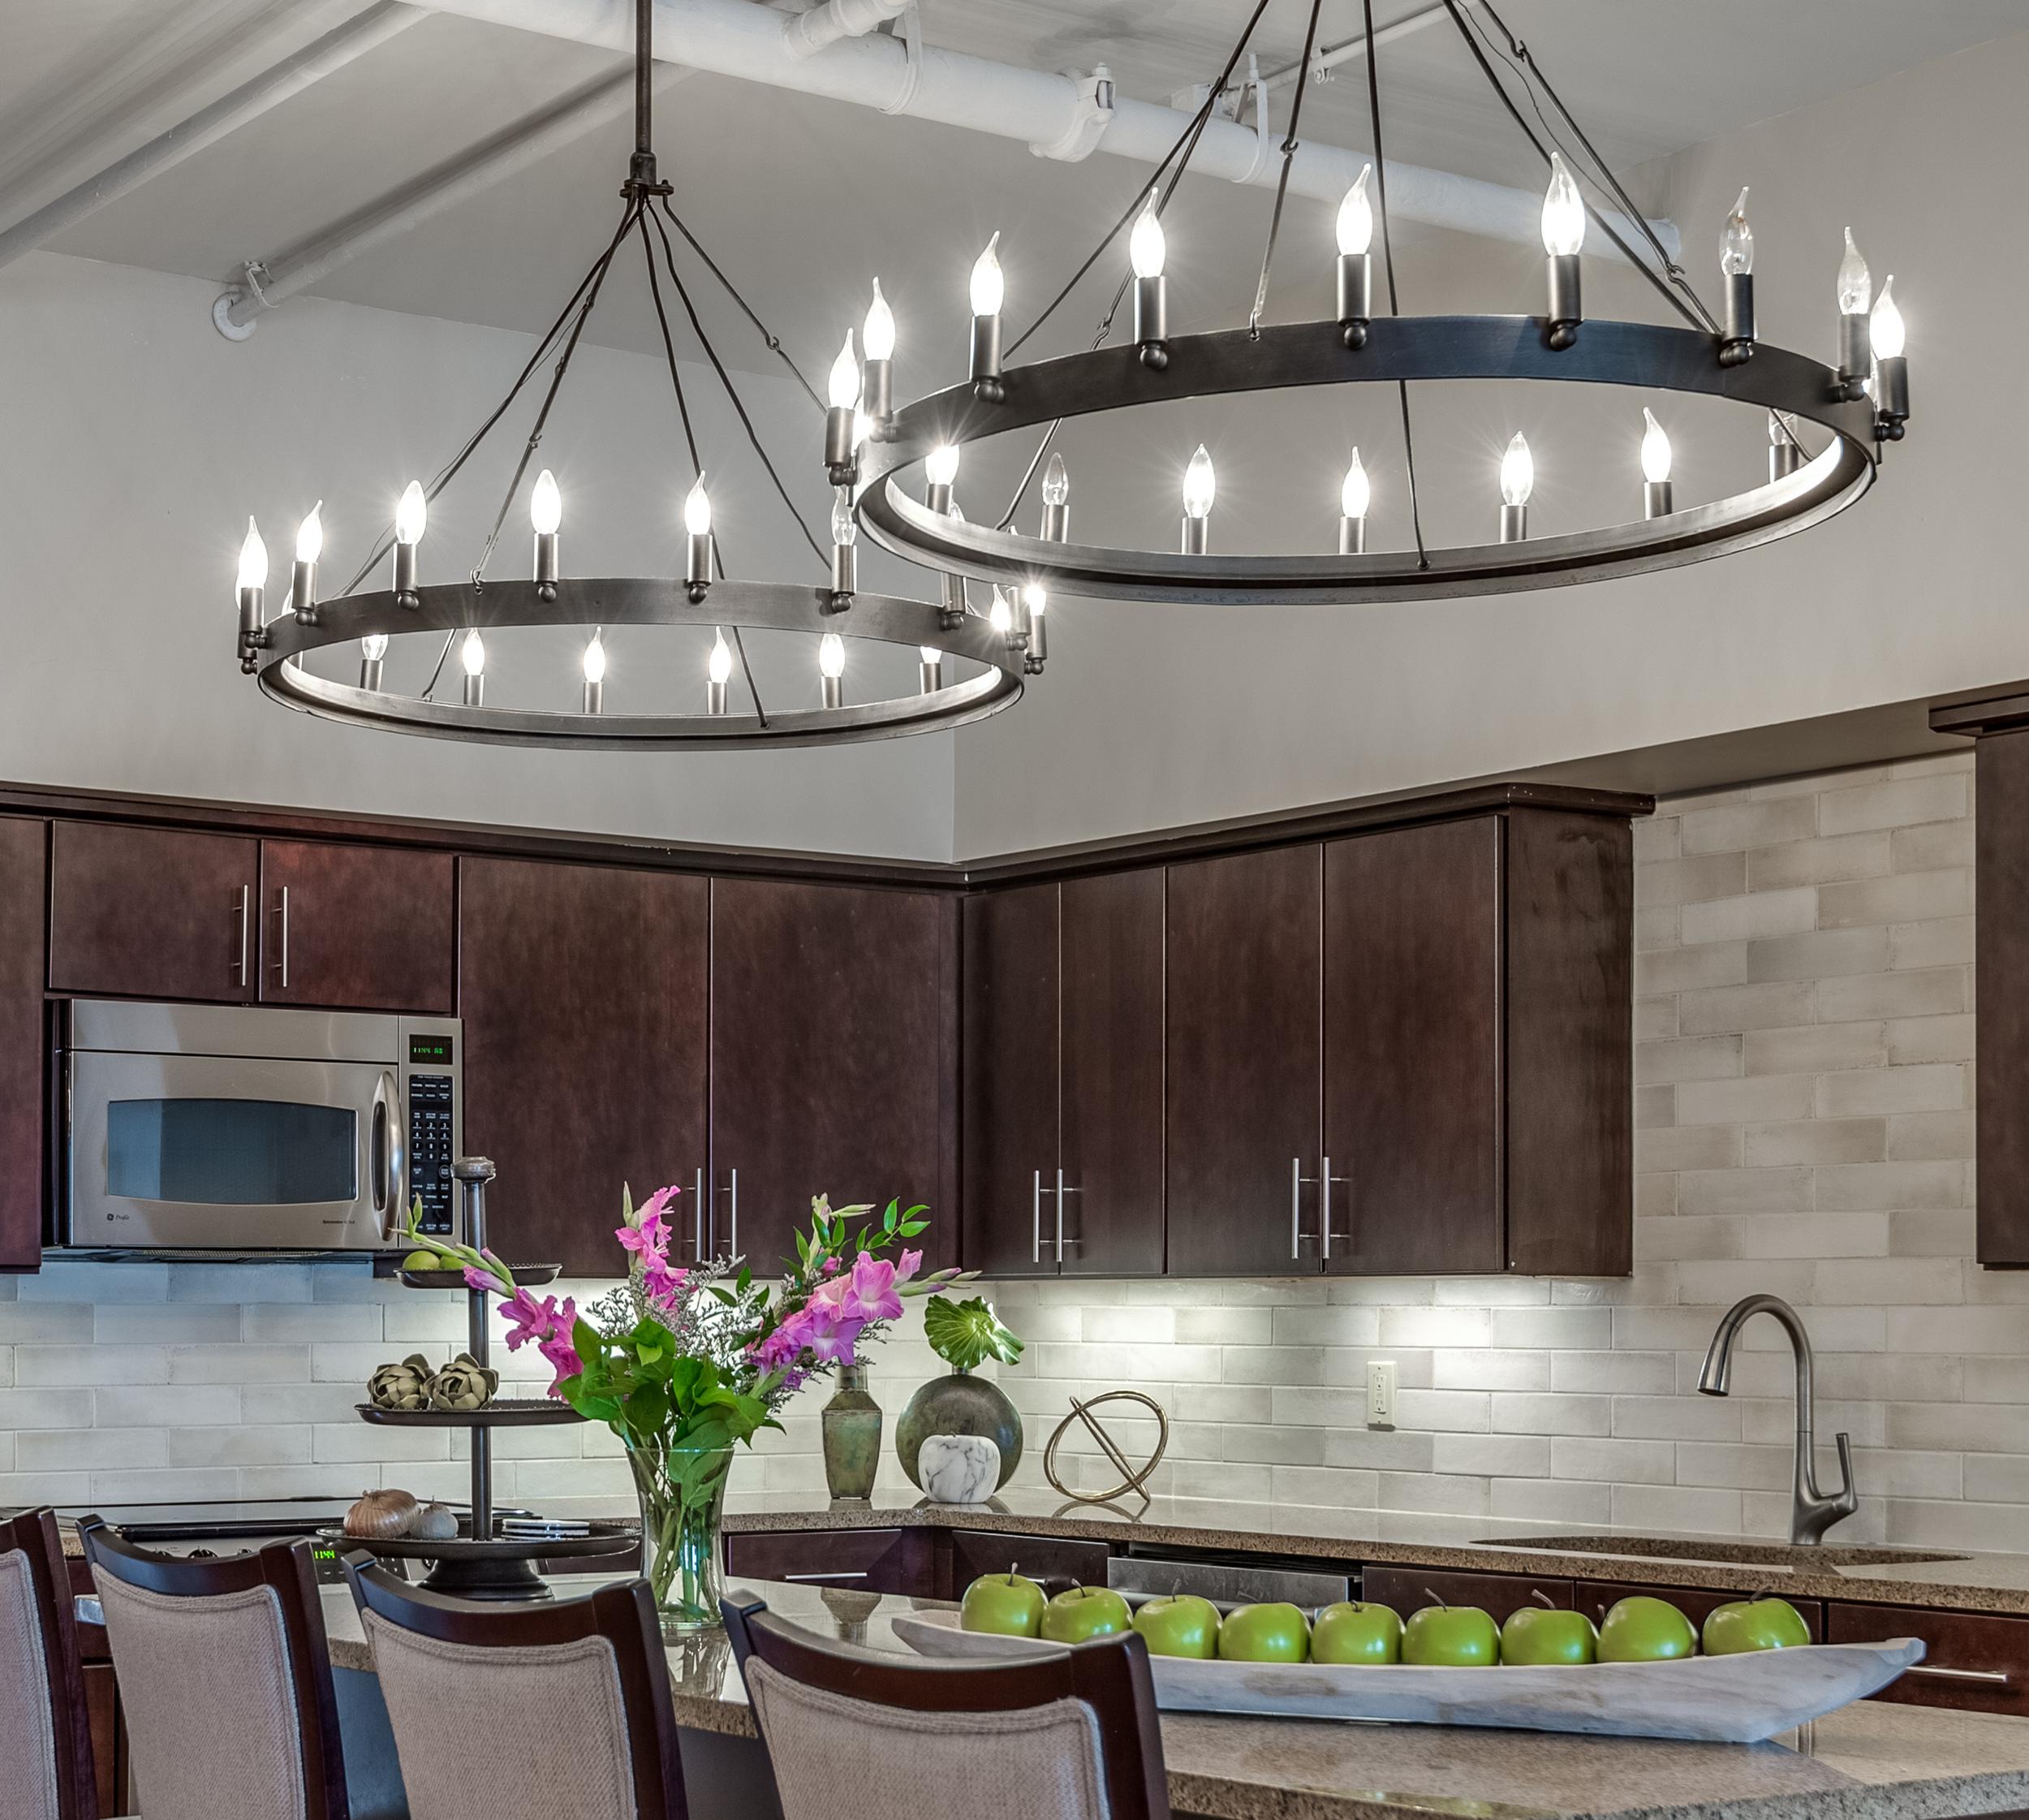 kitchen chandelier lighting ideas metairie uptown local interiors designers khb interiors